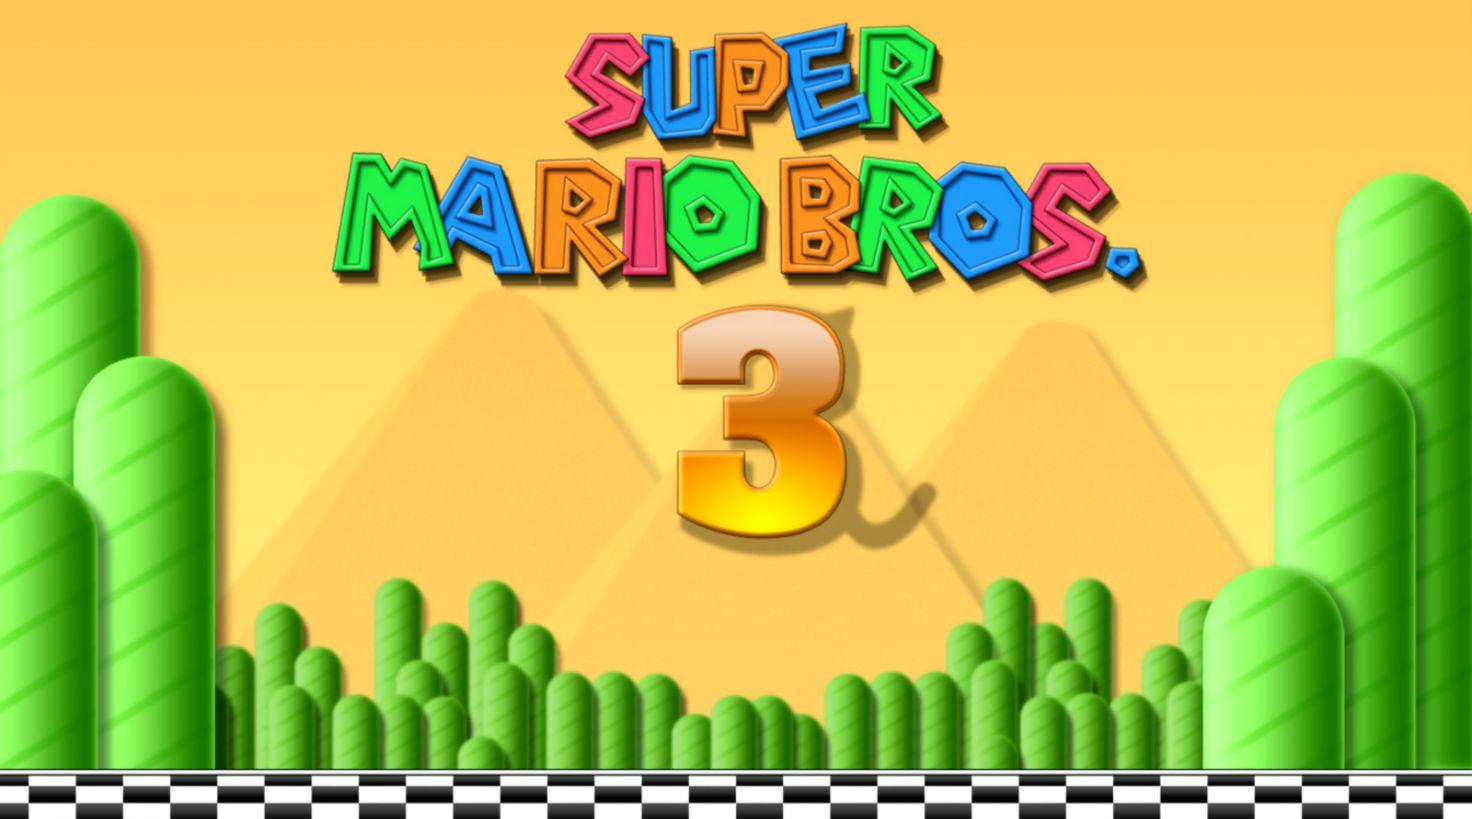 Super Mario Bros 3 Hd Wallpaper | Ucox Wallpapers